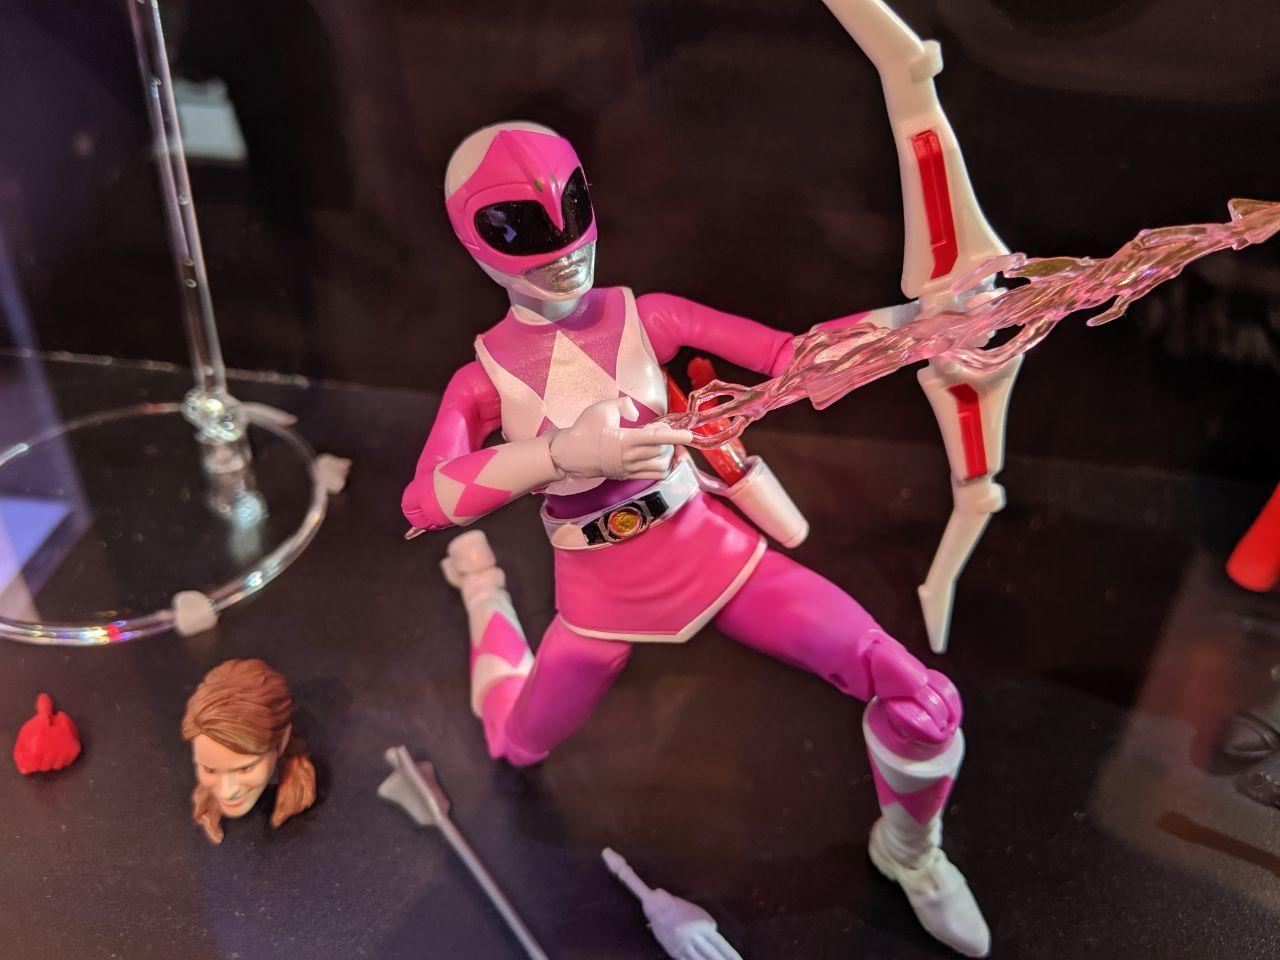 Mighty Morphin' Pink Ranger